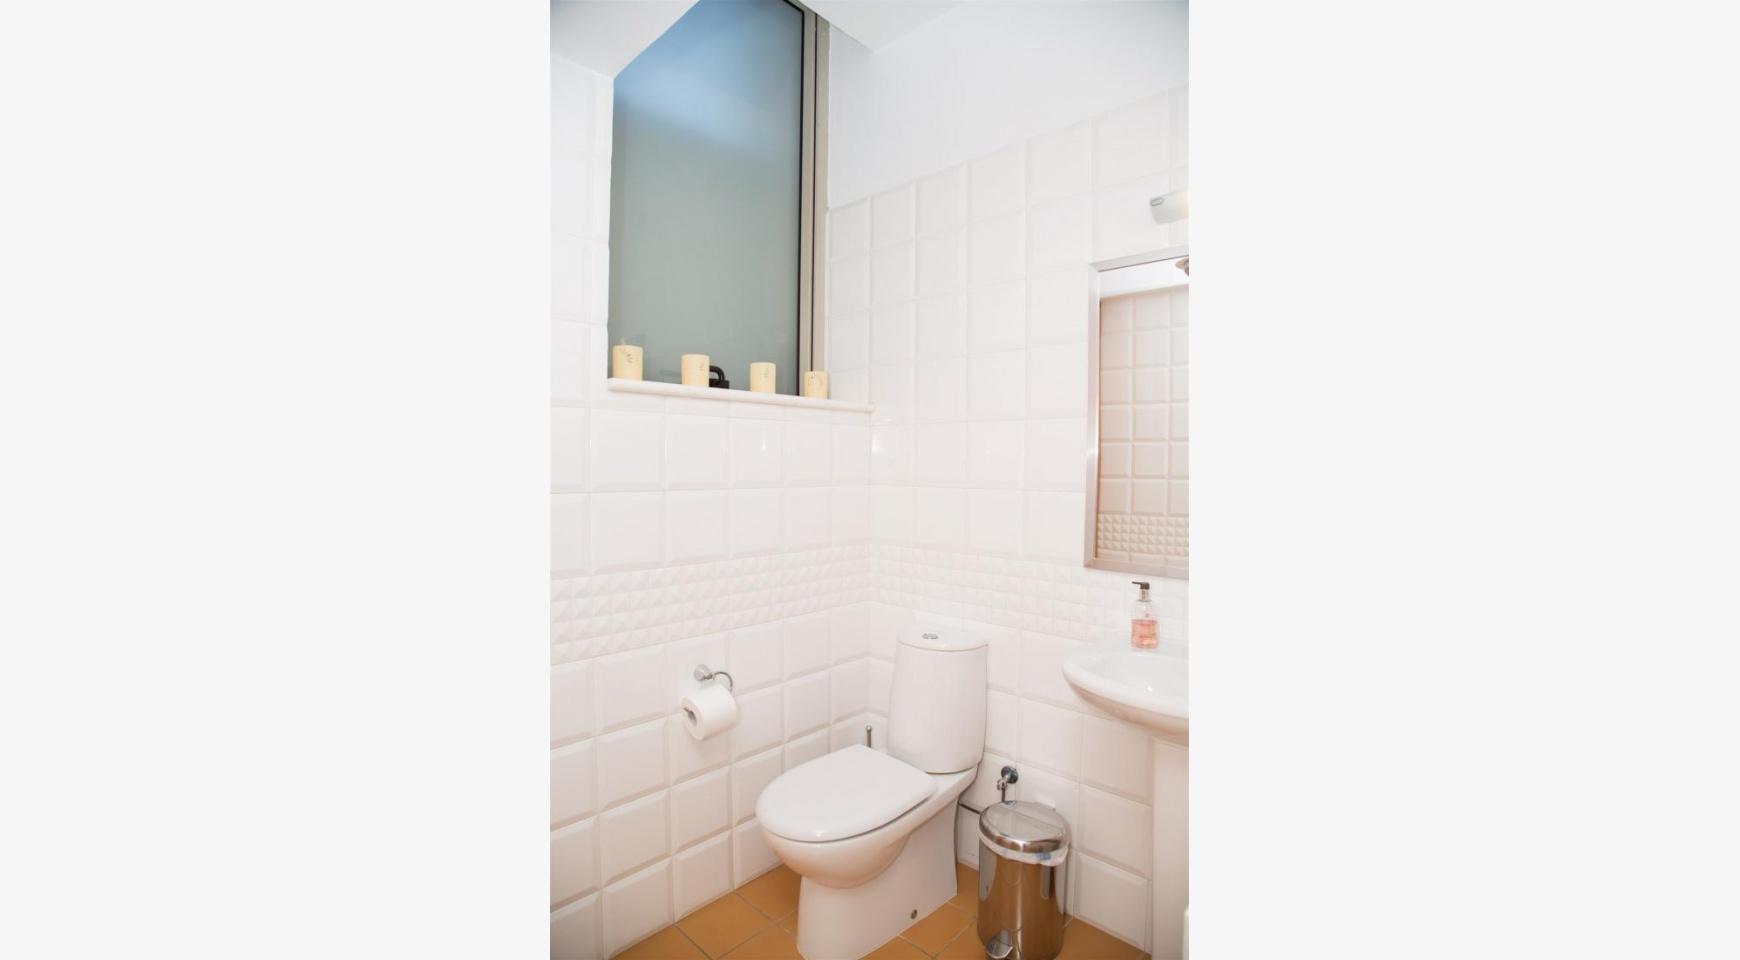 Modern Luxury 4 Bedroom Villa in Sfalagiotisa, Agios Athanasios - 34